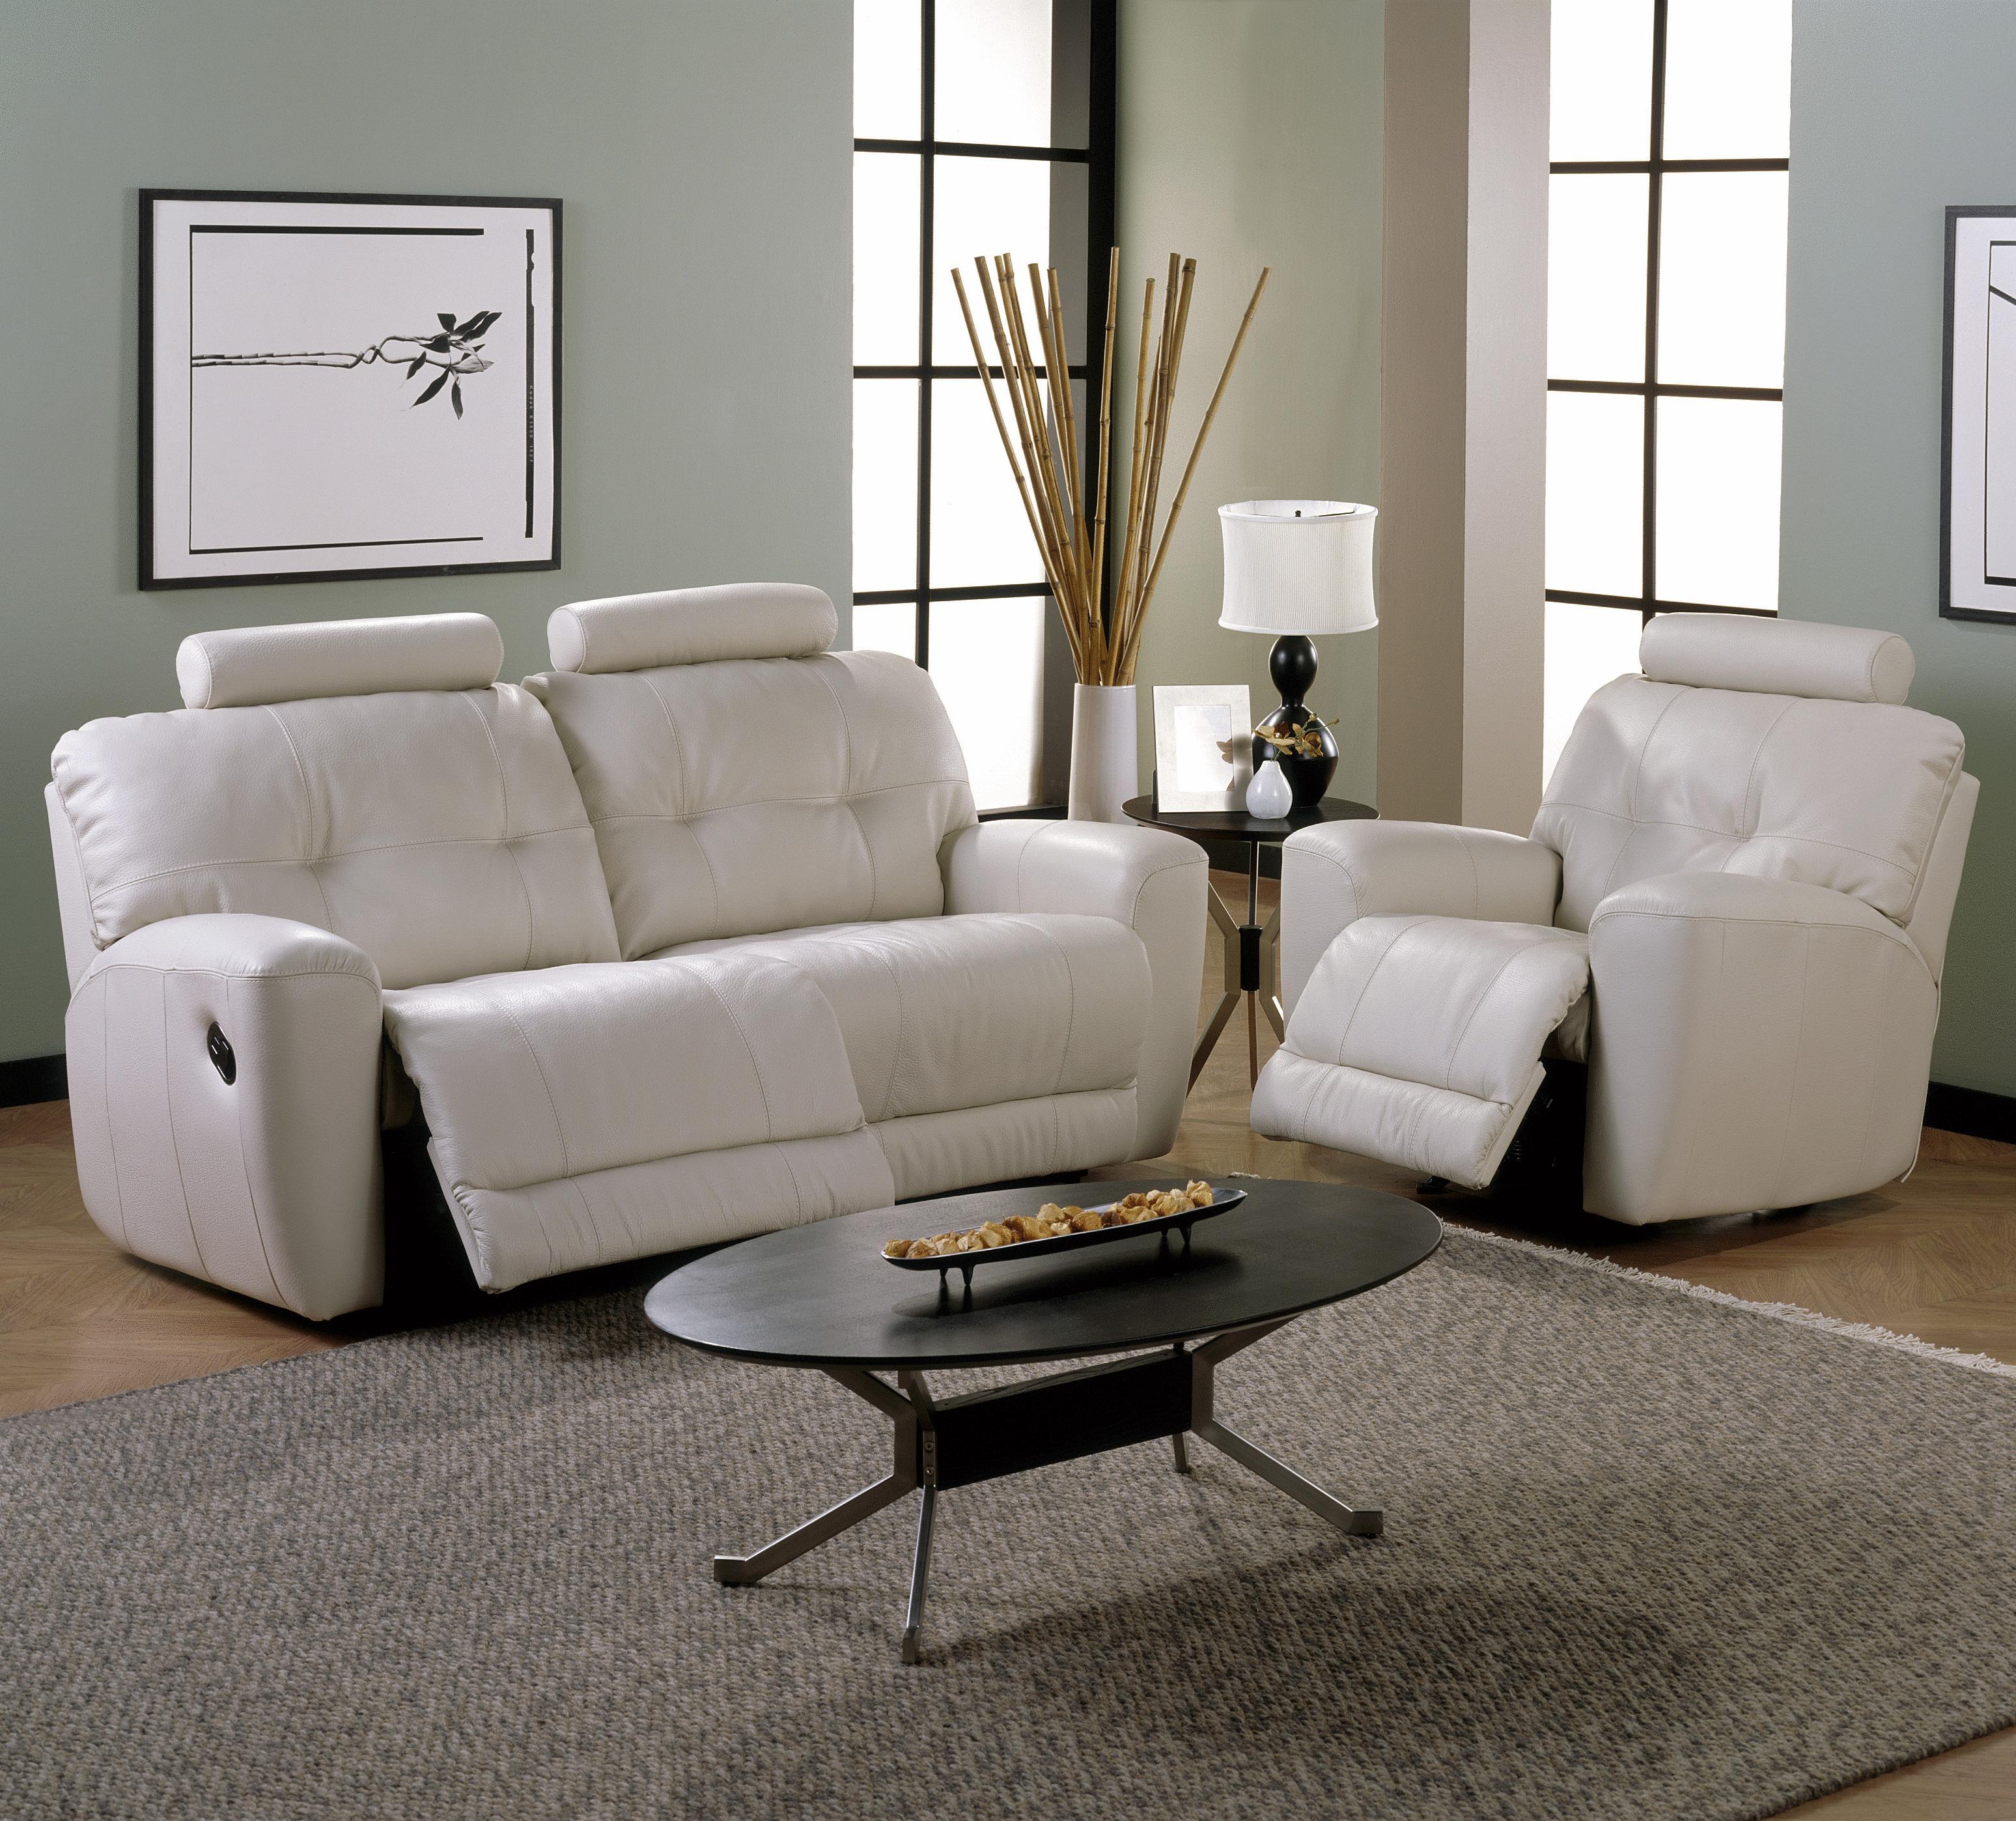 Palliser Galore Reclining Living Room Group - Item Number: 41017 Living Room Group 3